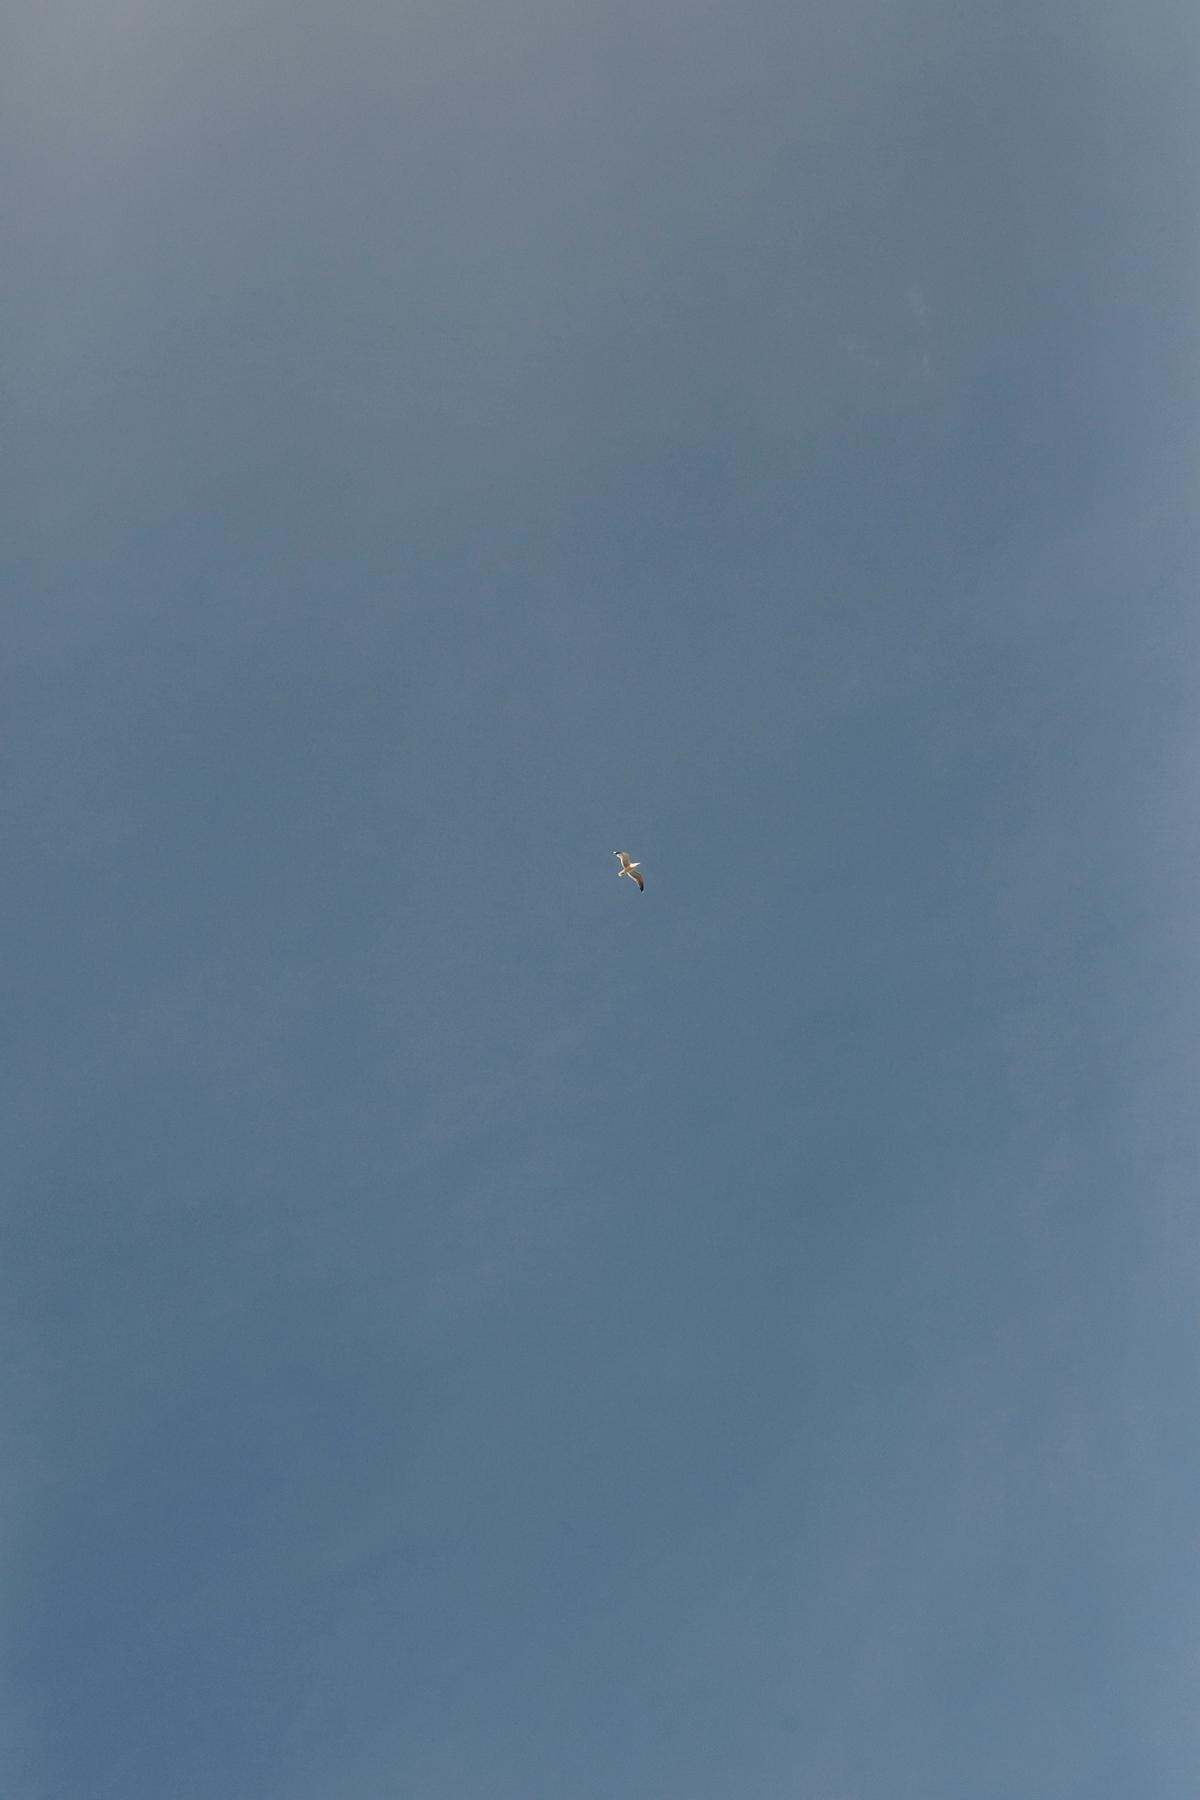 Birds in the blue sky.